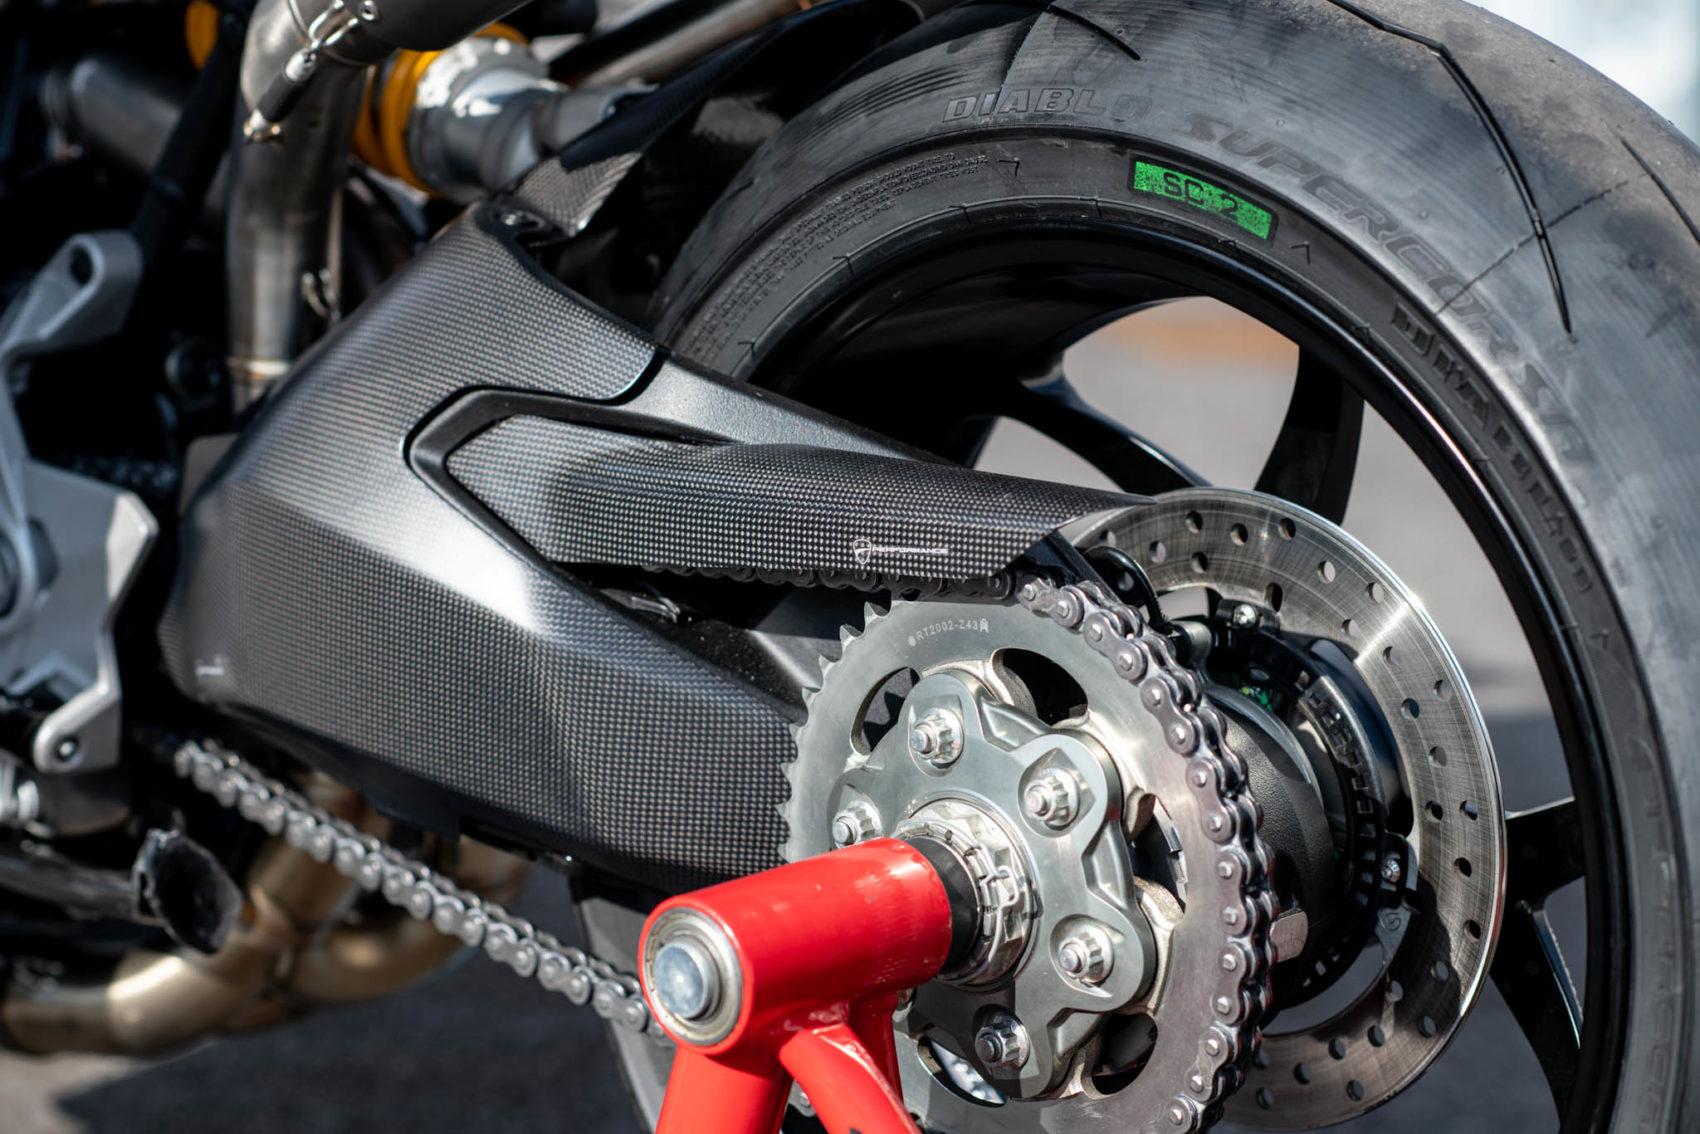 Ducati monobras